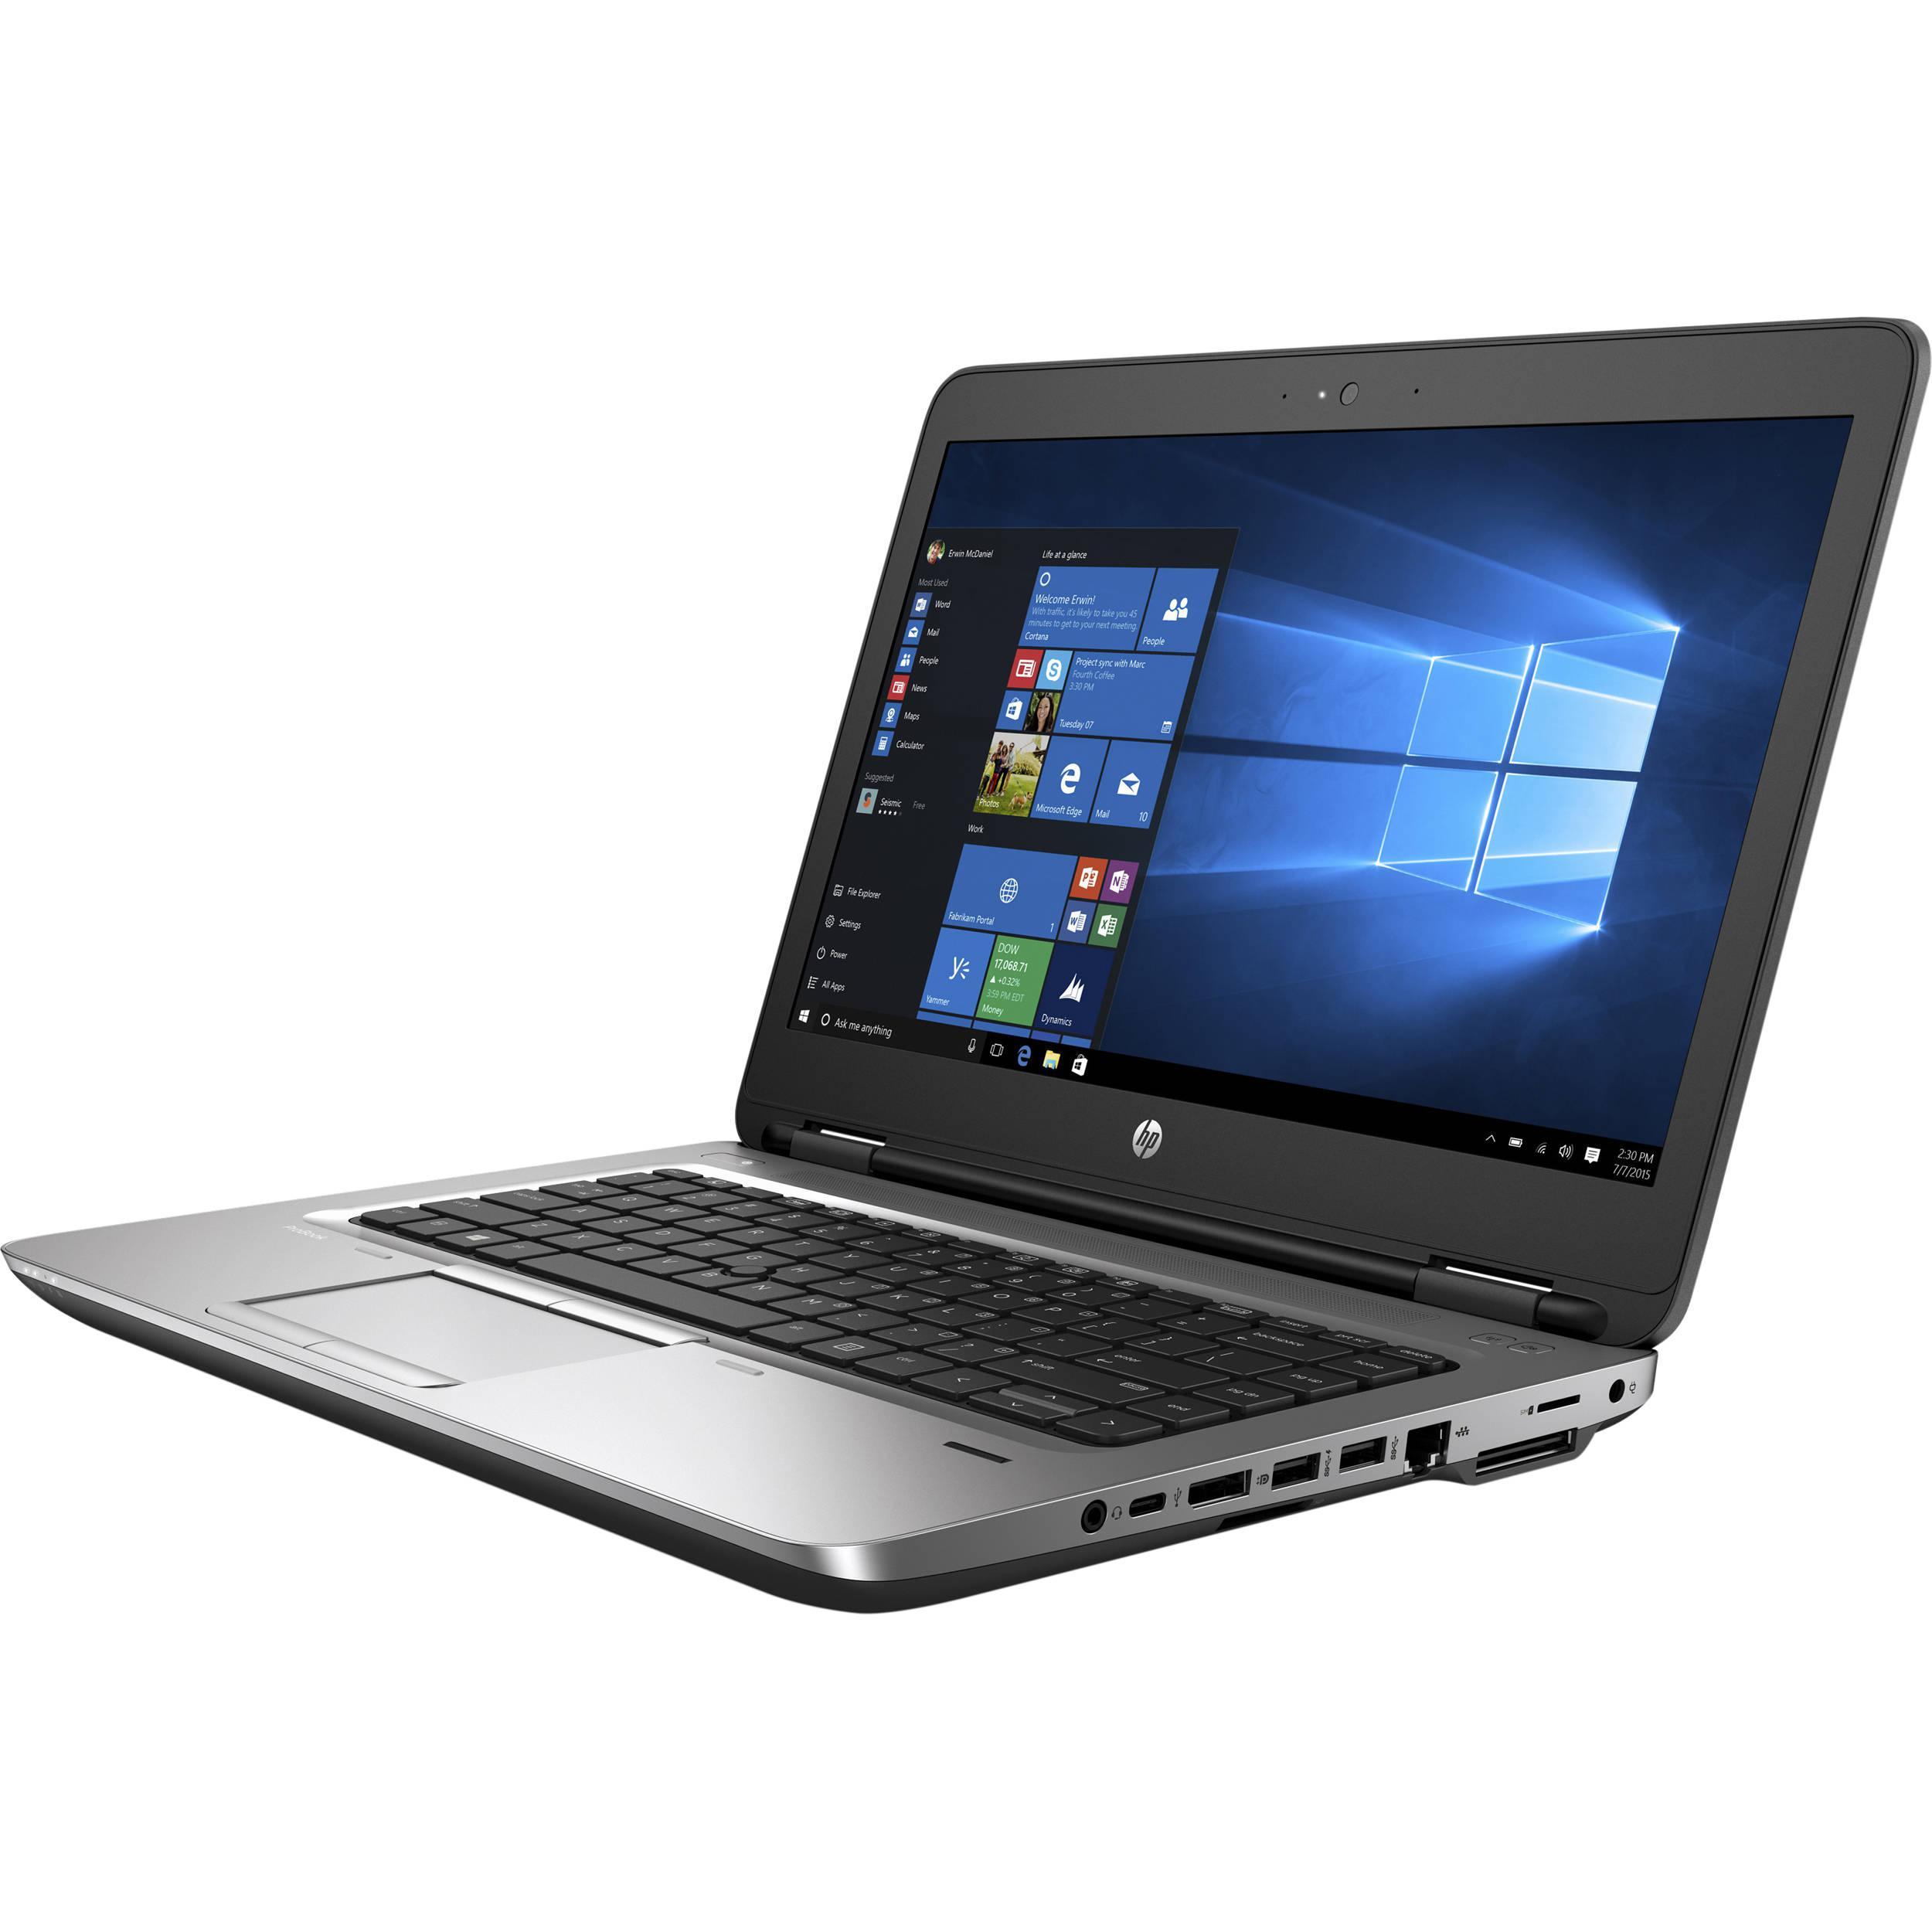 Hp ProBook 640 G2 14-inch (2016) - Core i5-6300U - 16 GB - SSD 512 GB